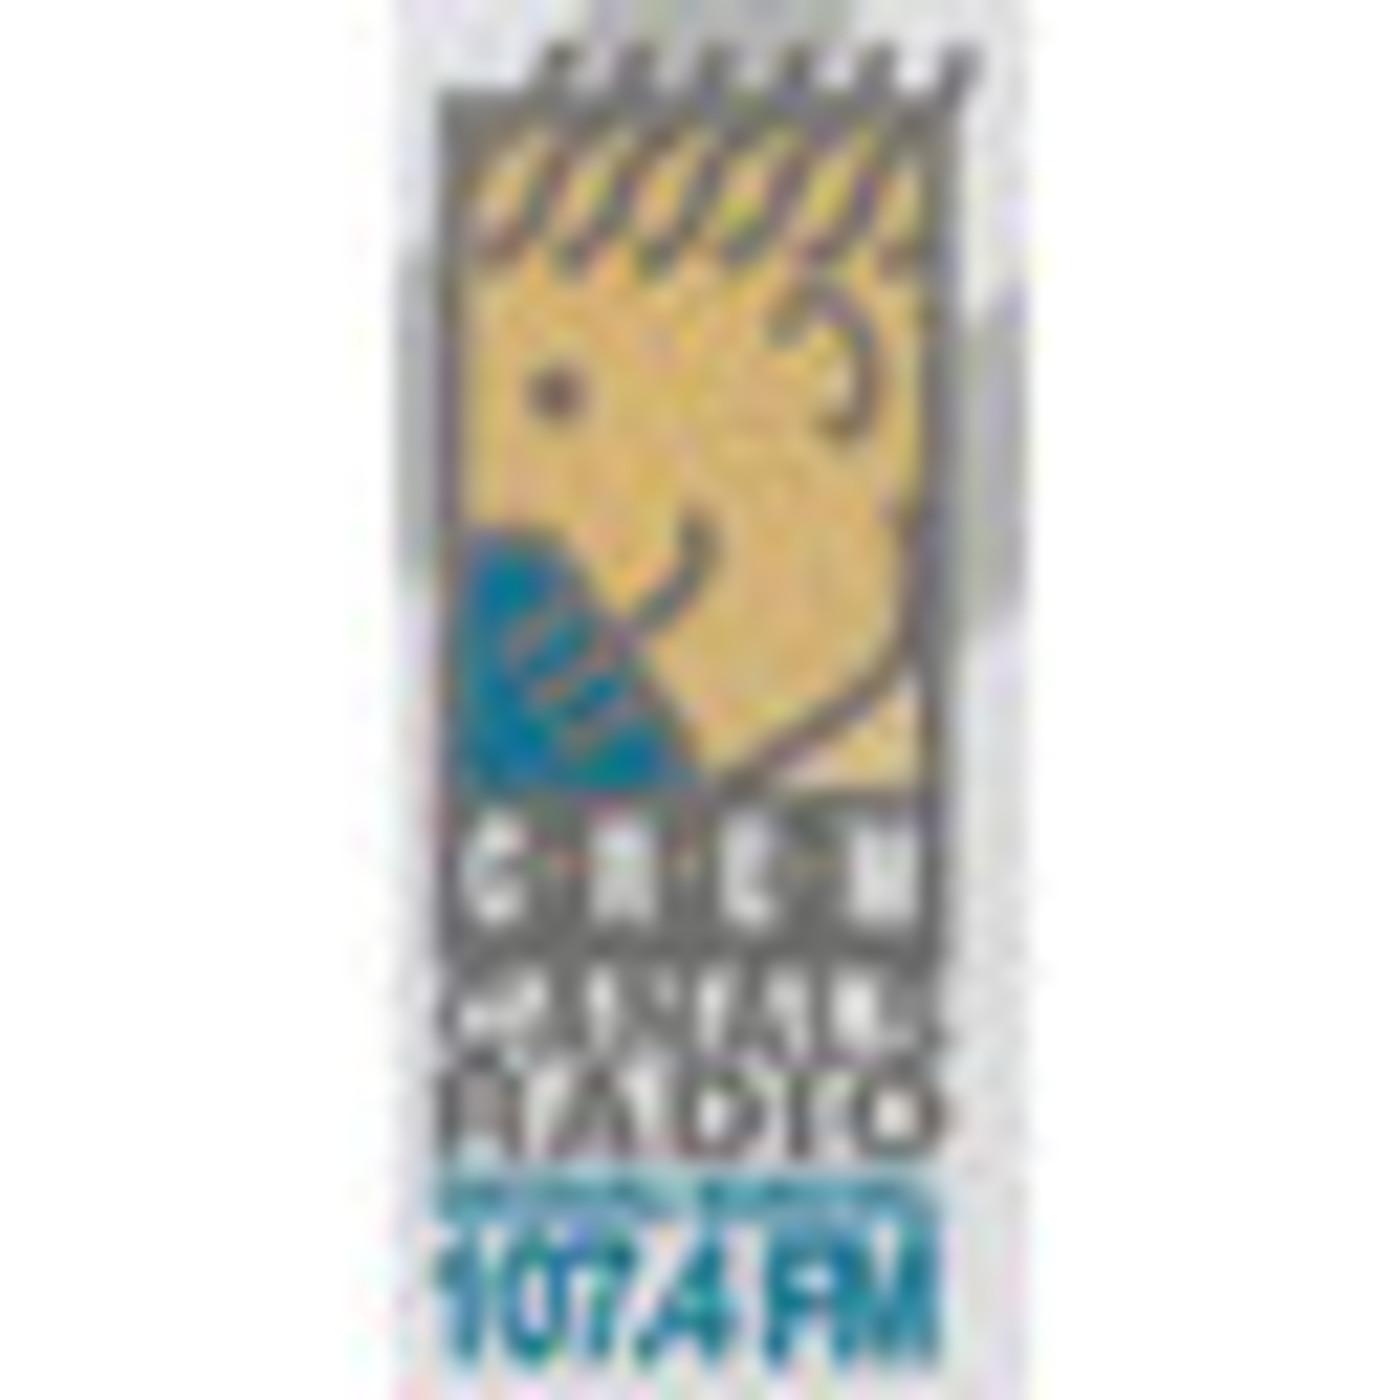 Canals Radio